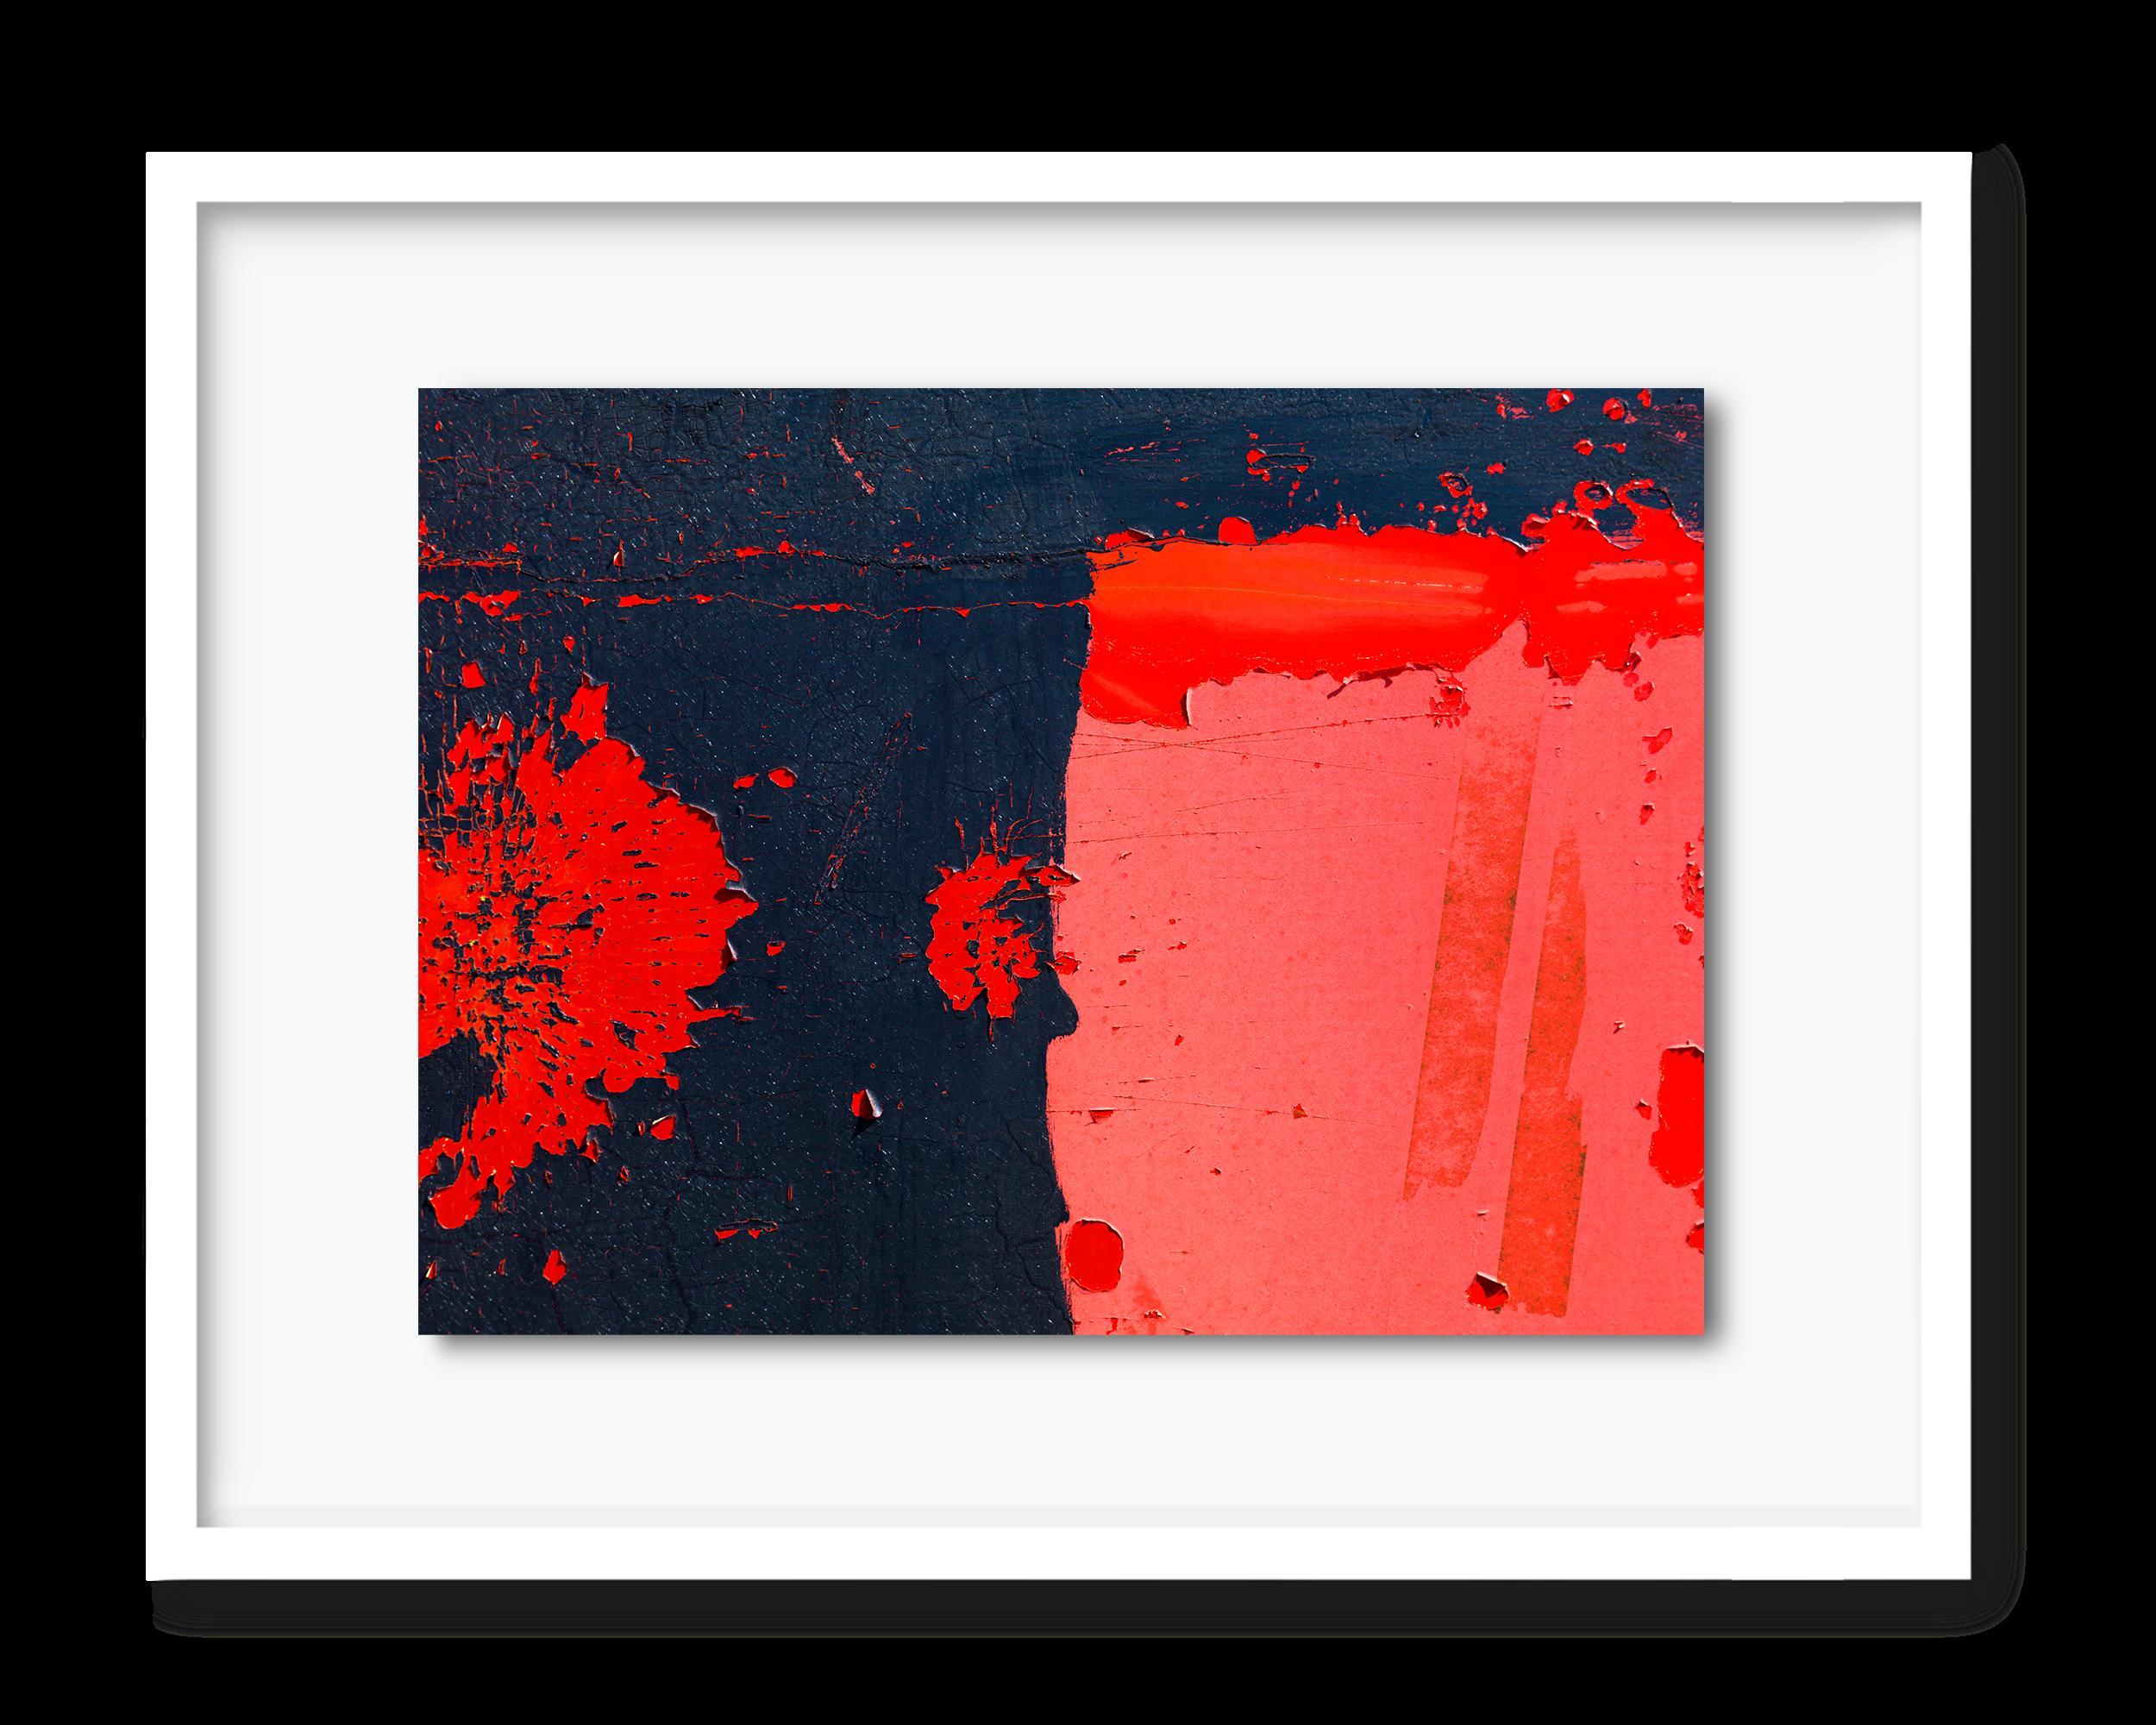 43.david-pearce-peeling-paint5.png